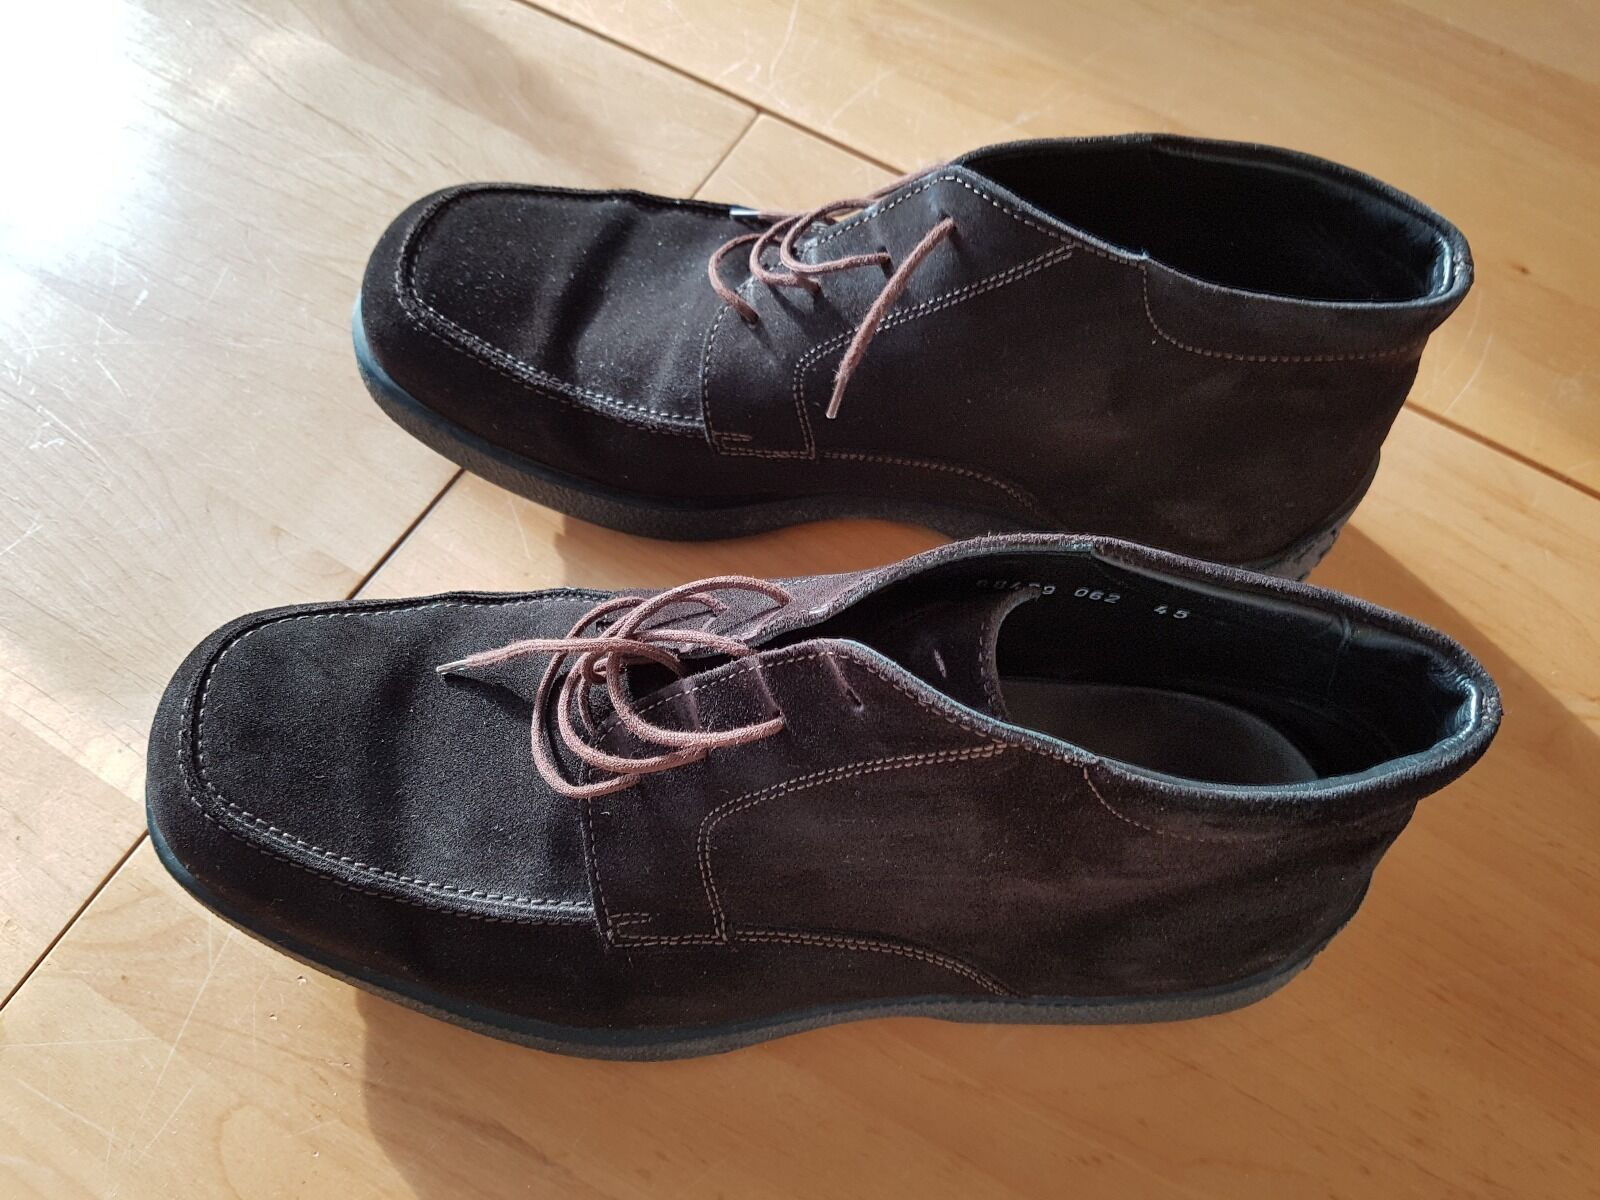 Ralph Harrison Herren Stiefelette Boots Gr. 45 Top